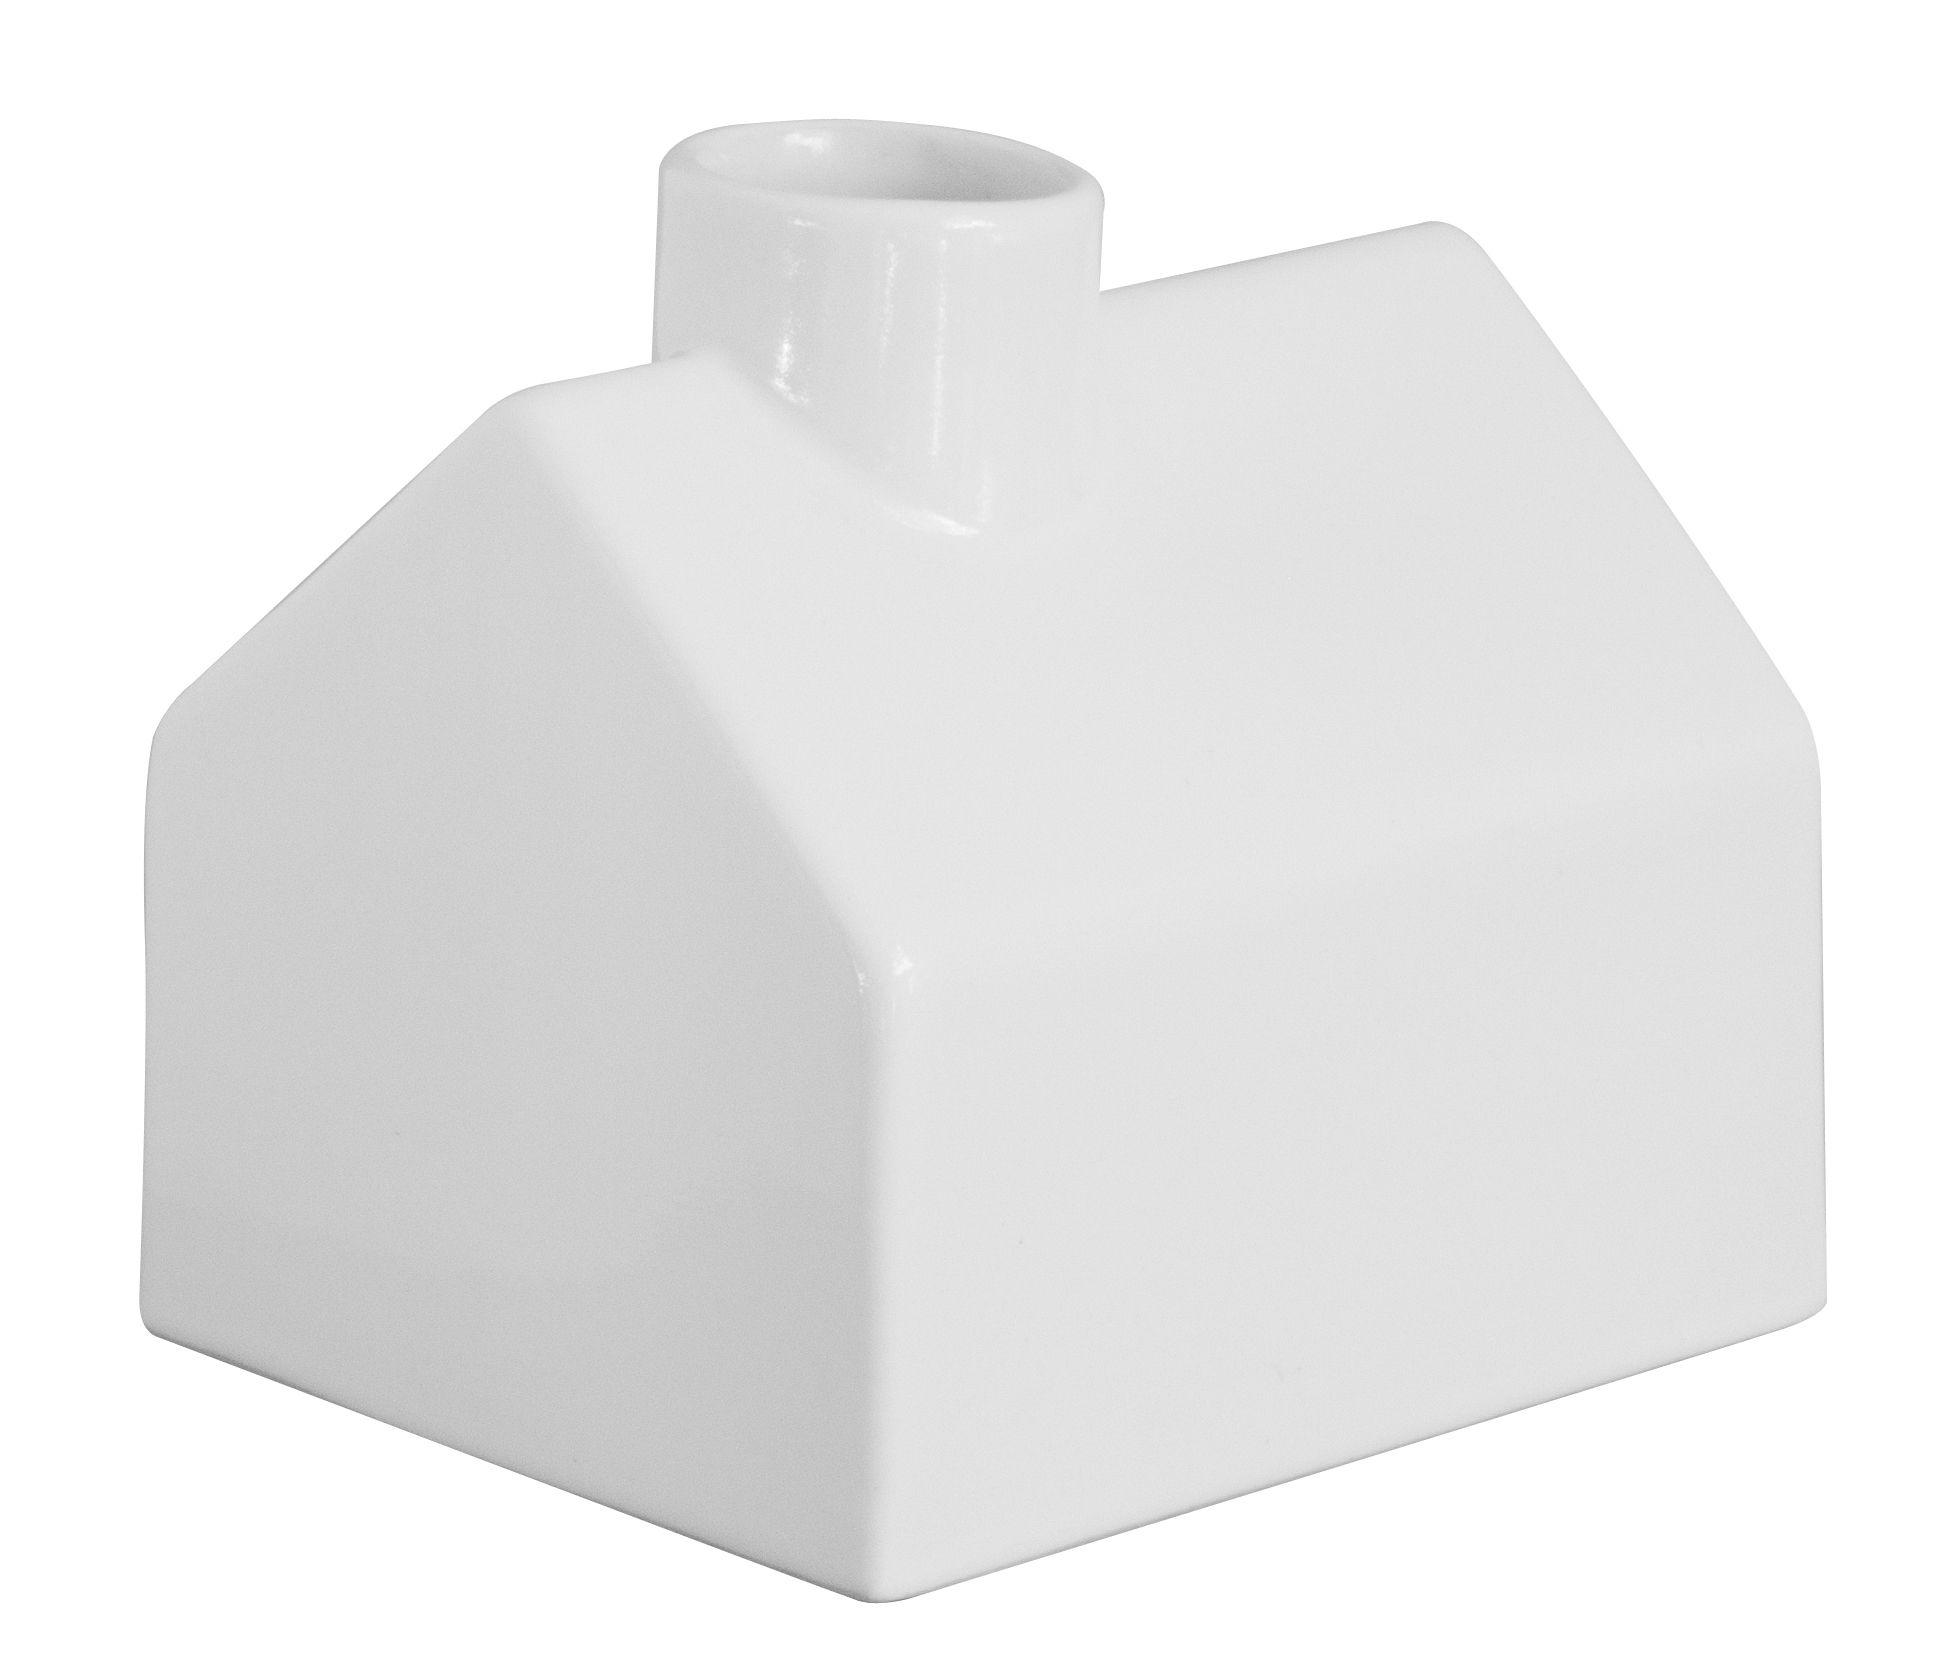 Soliflore casablanca humidificateur radiateur blanc - Humidificateur pour radiateur ...